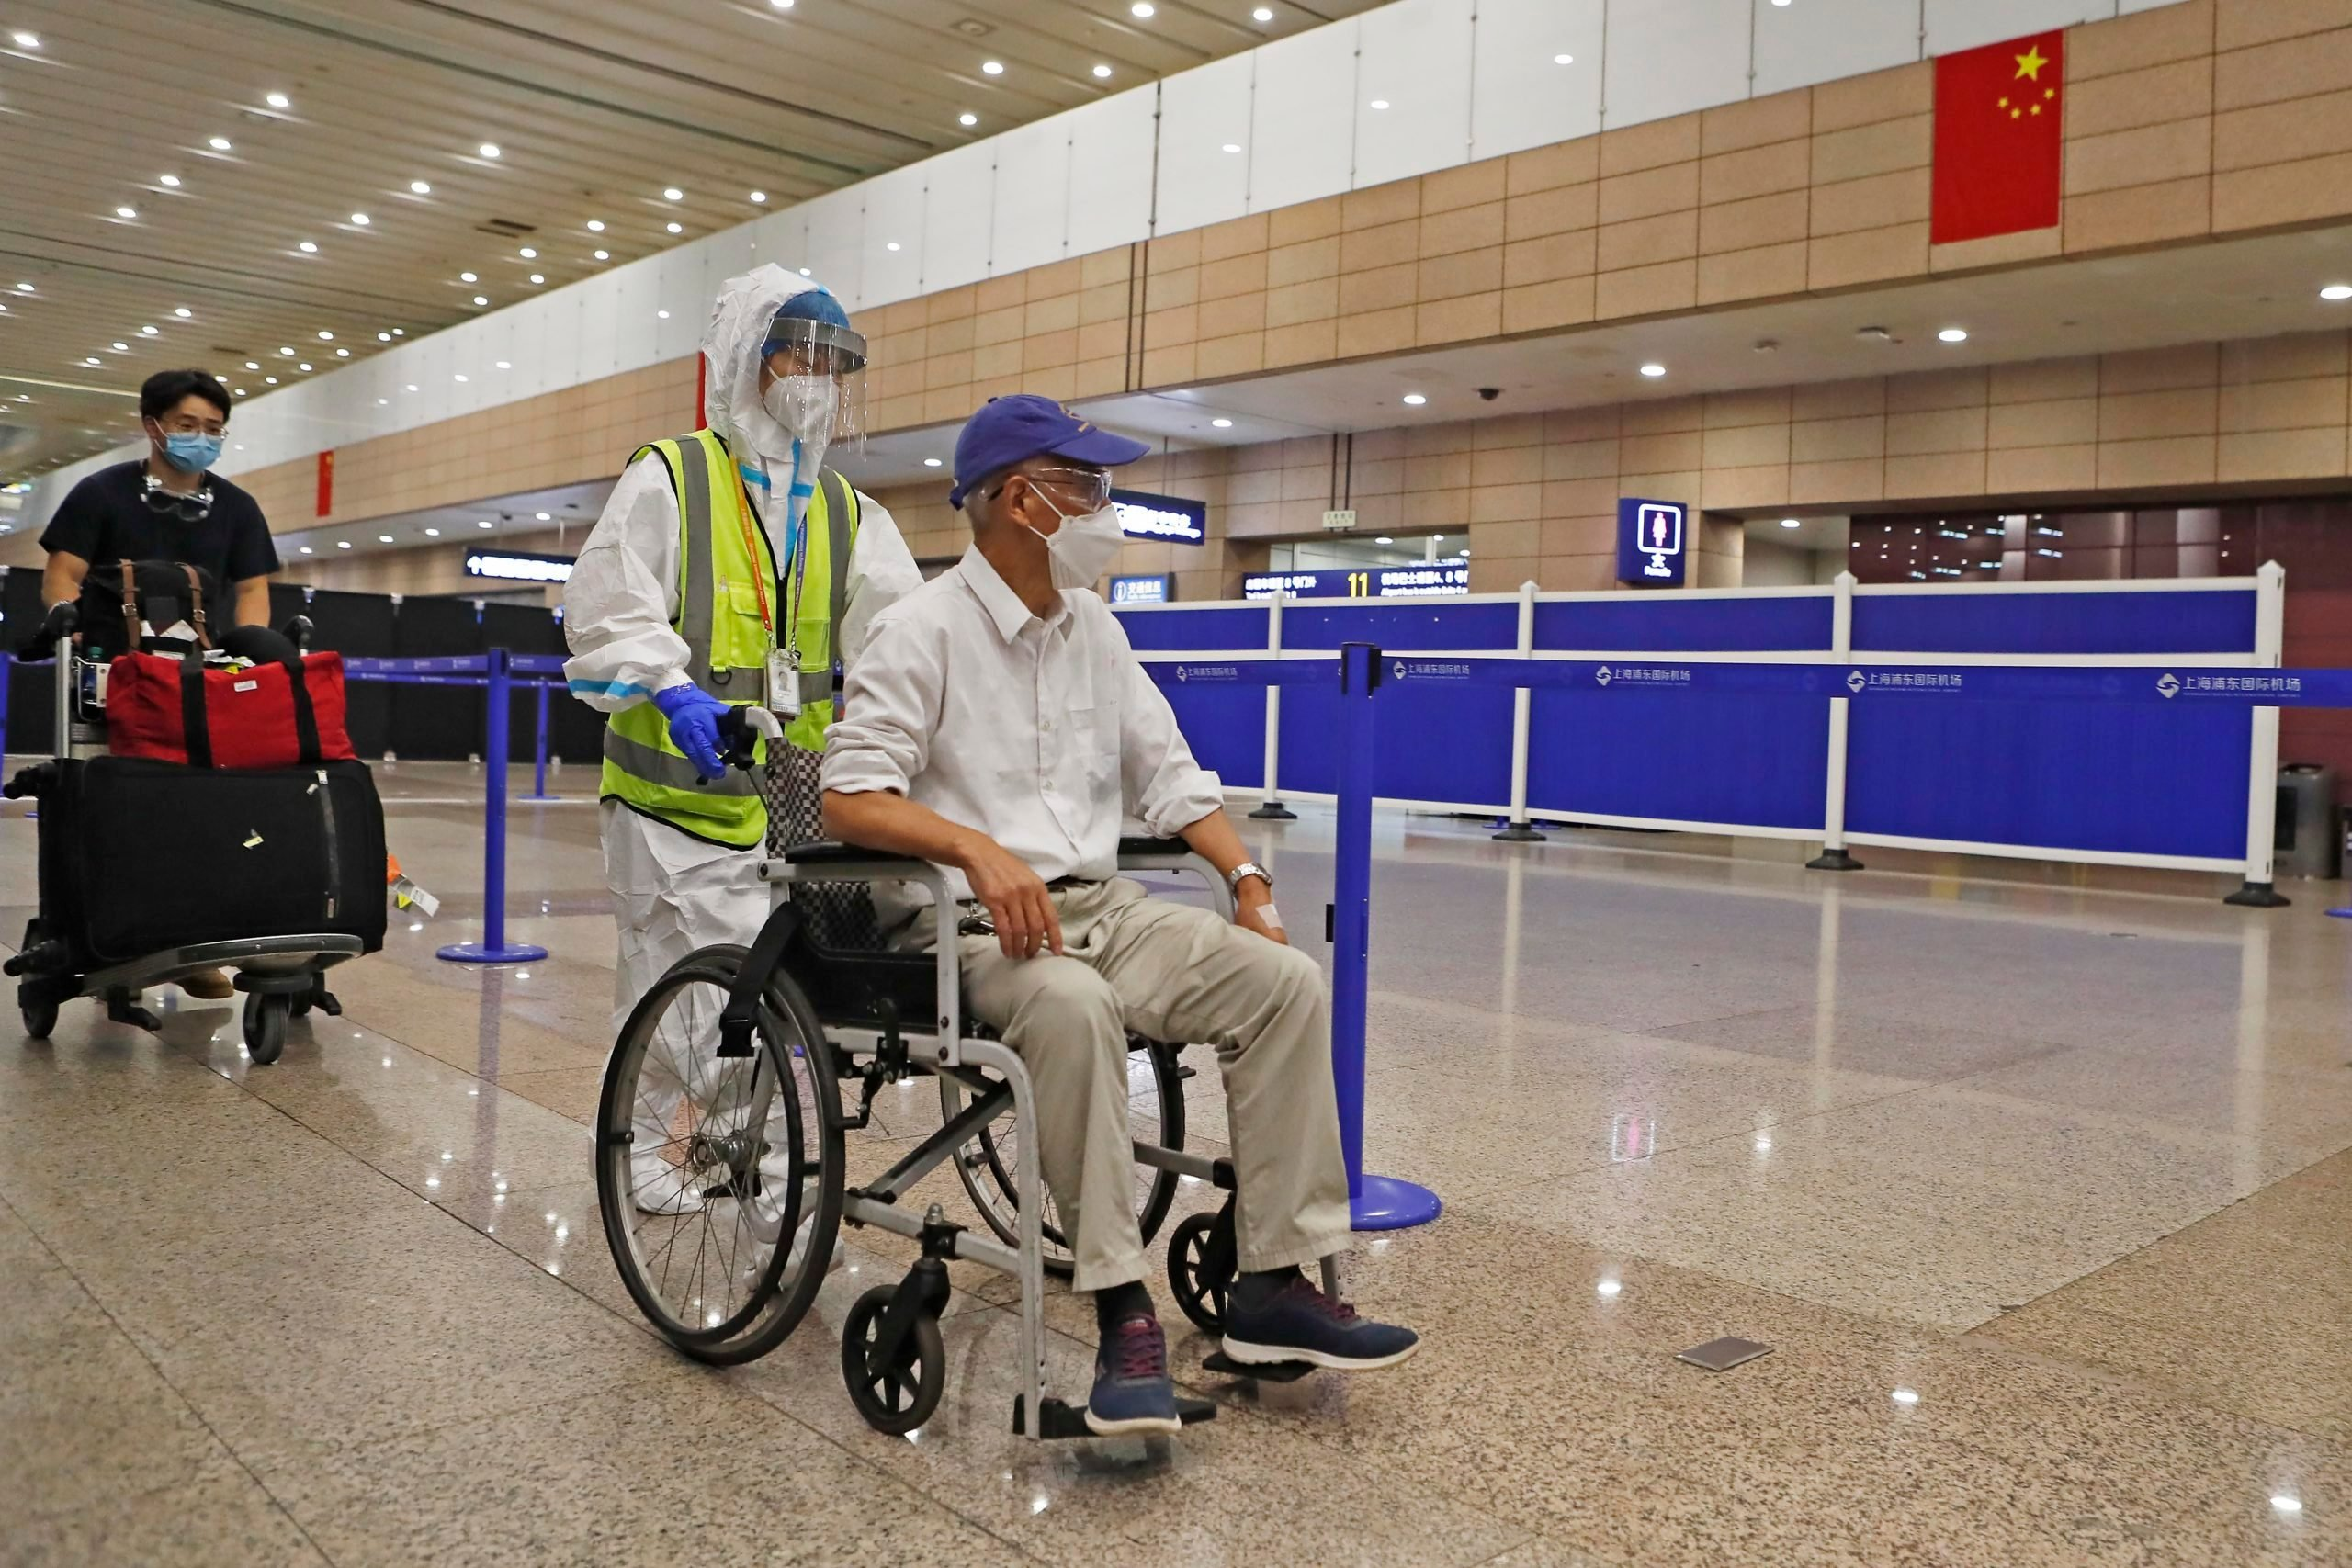 Daily Life In Shanghai Amid The Coronavirus Outbreak